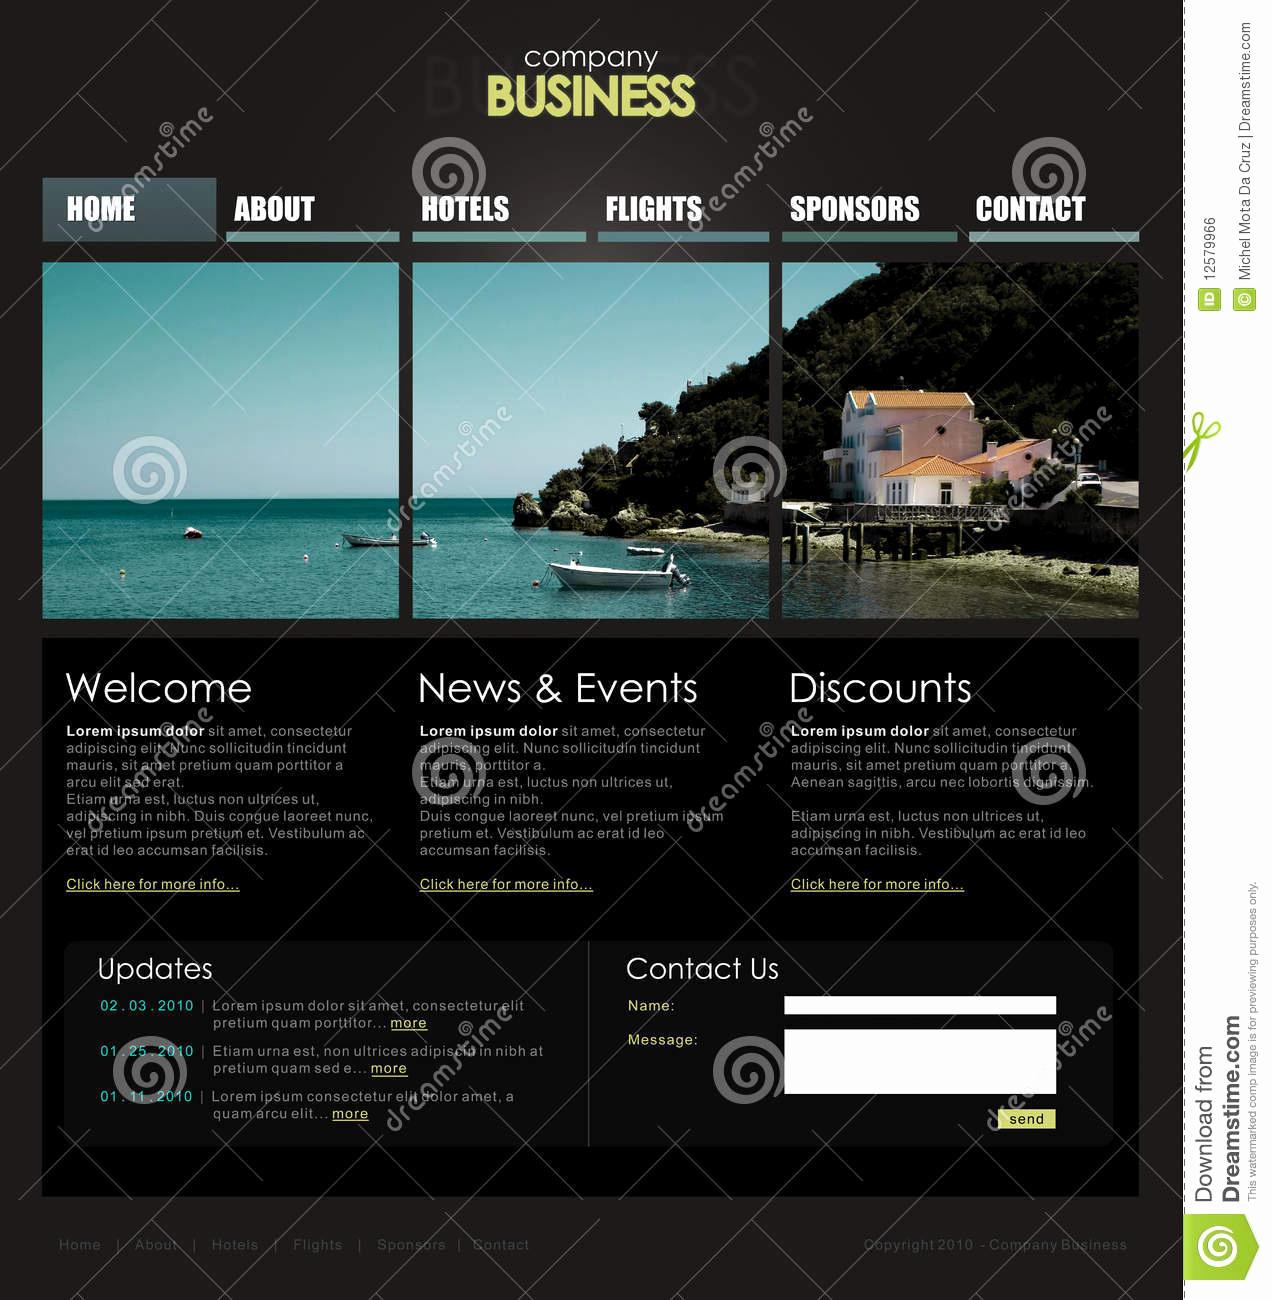 Free Professional Website Templates Elegant Professional Website Template Stock Vector Illustration